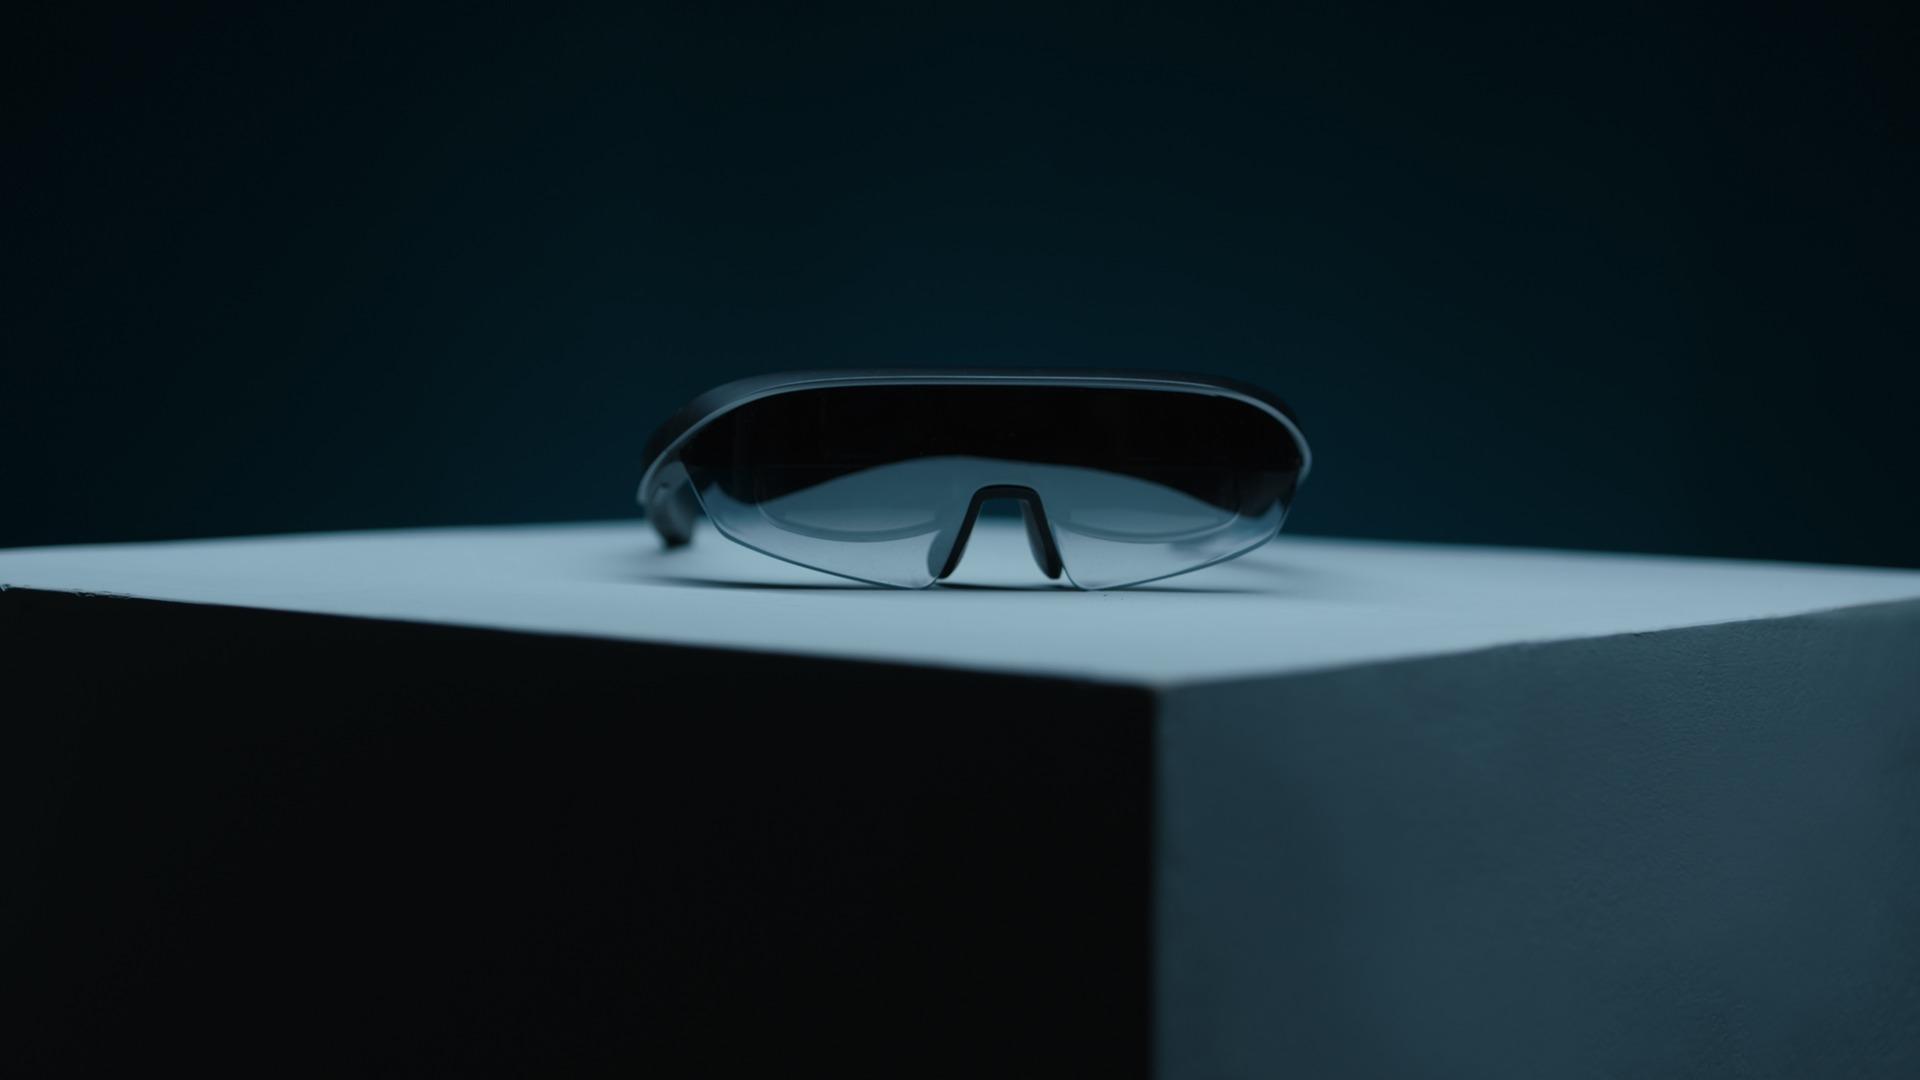 AR眼镜 EM3 STELLAR发布:53°FOV大屏、虚拟多屏会议、3D成像